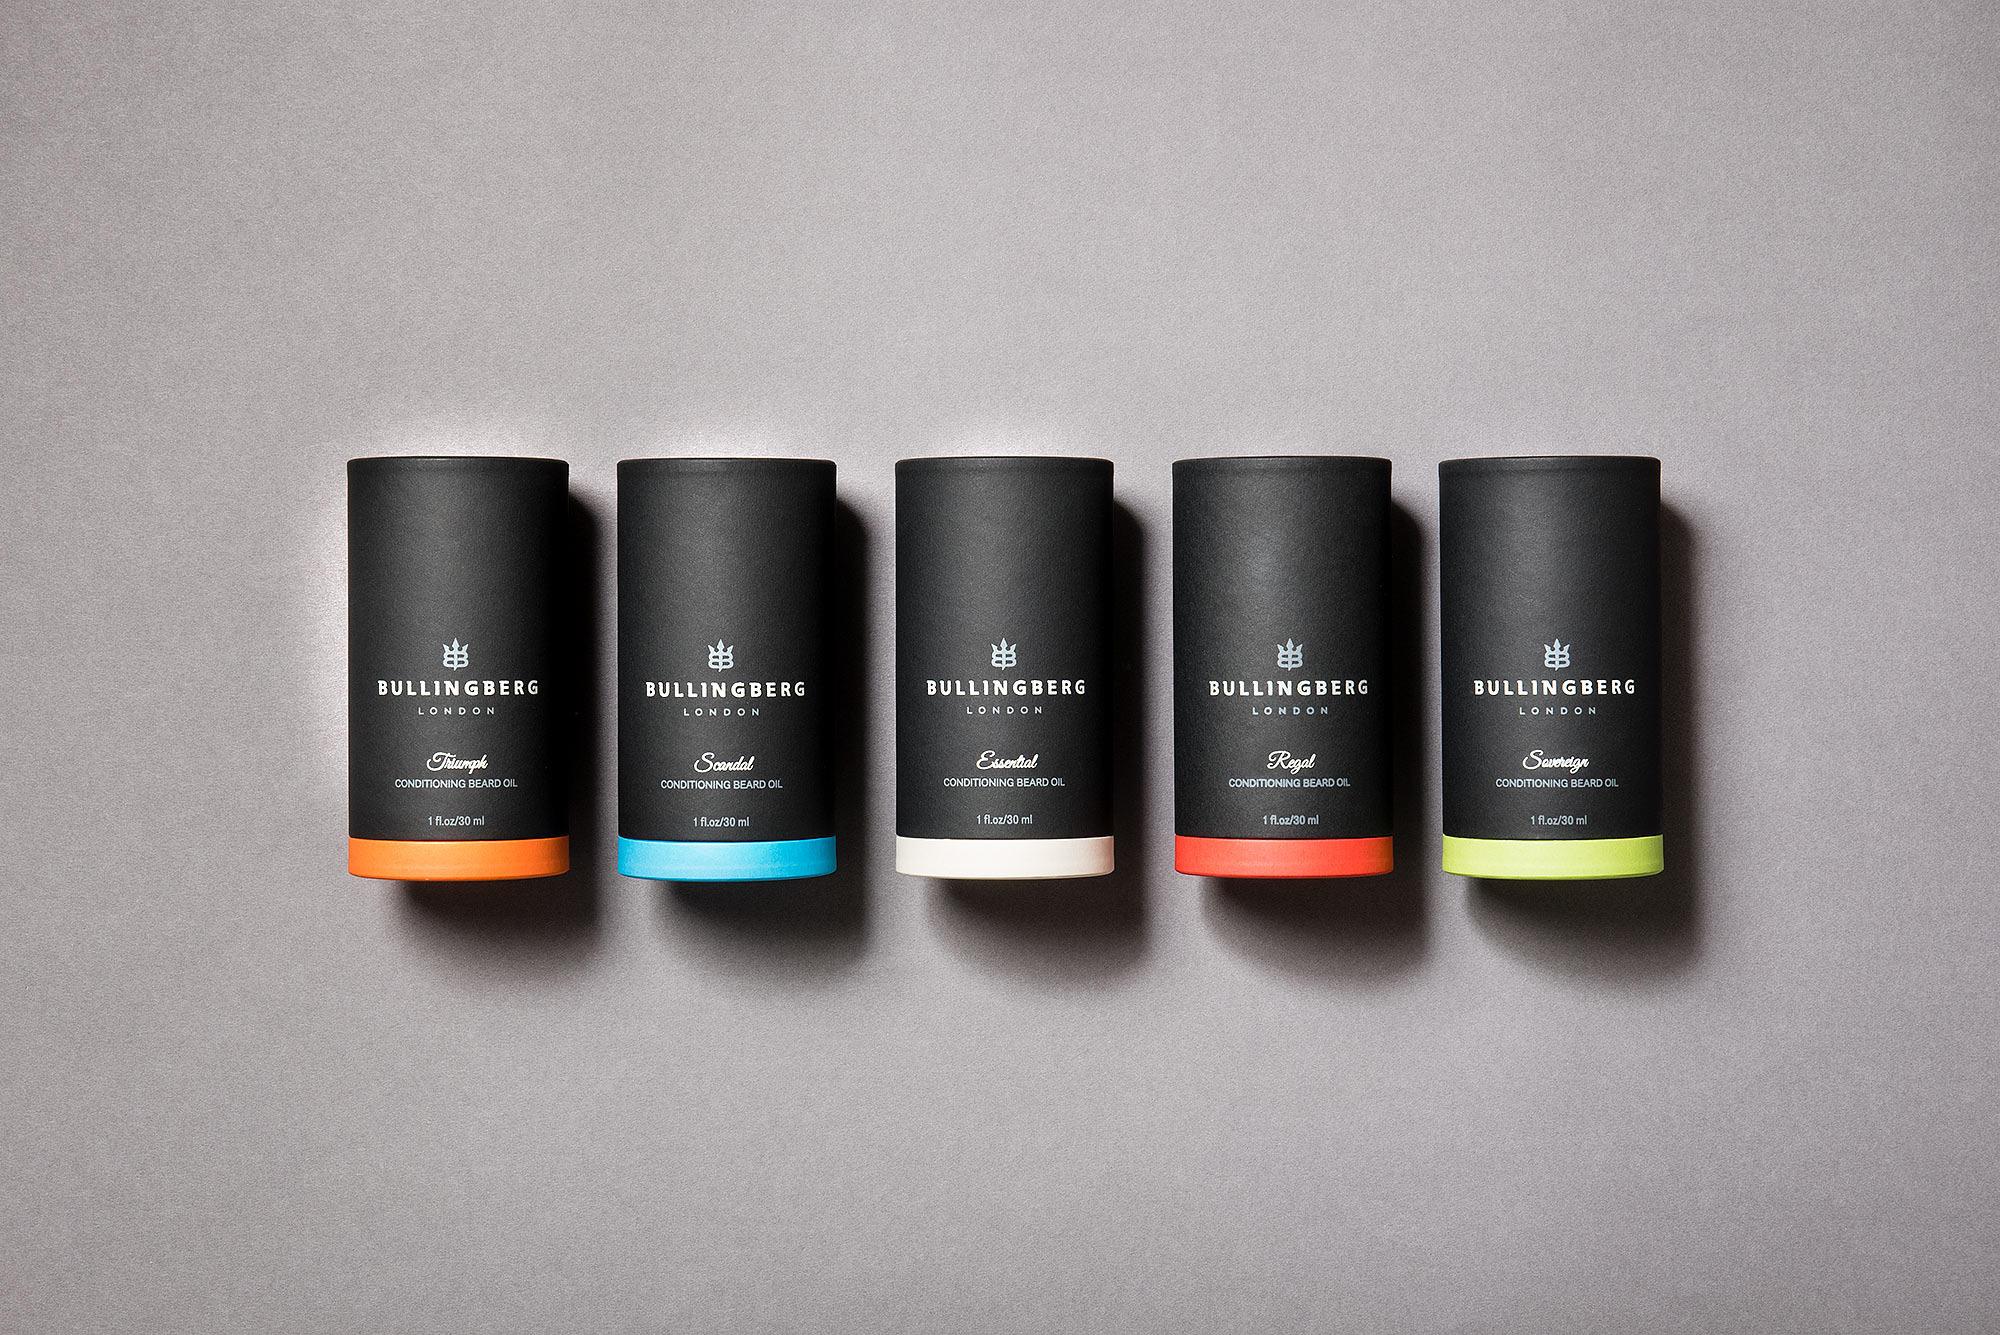 Bullingberg Beard Oils Creative Package Design